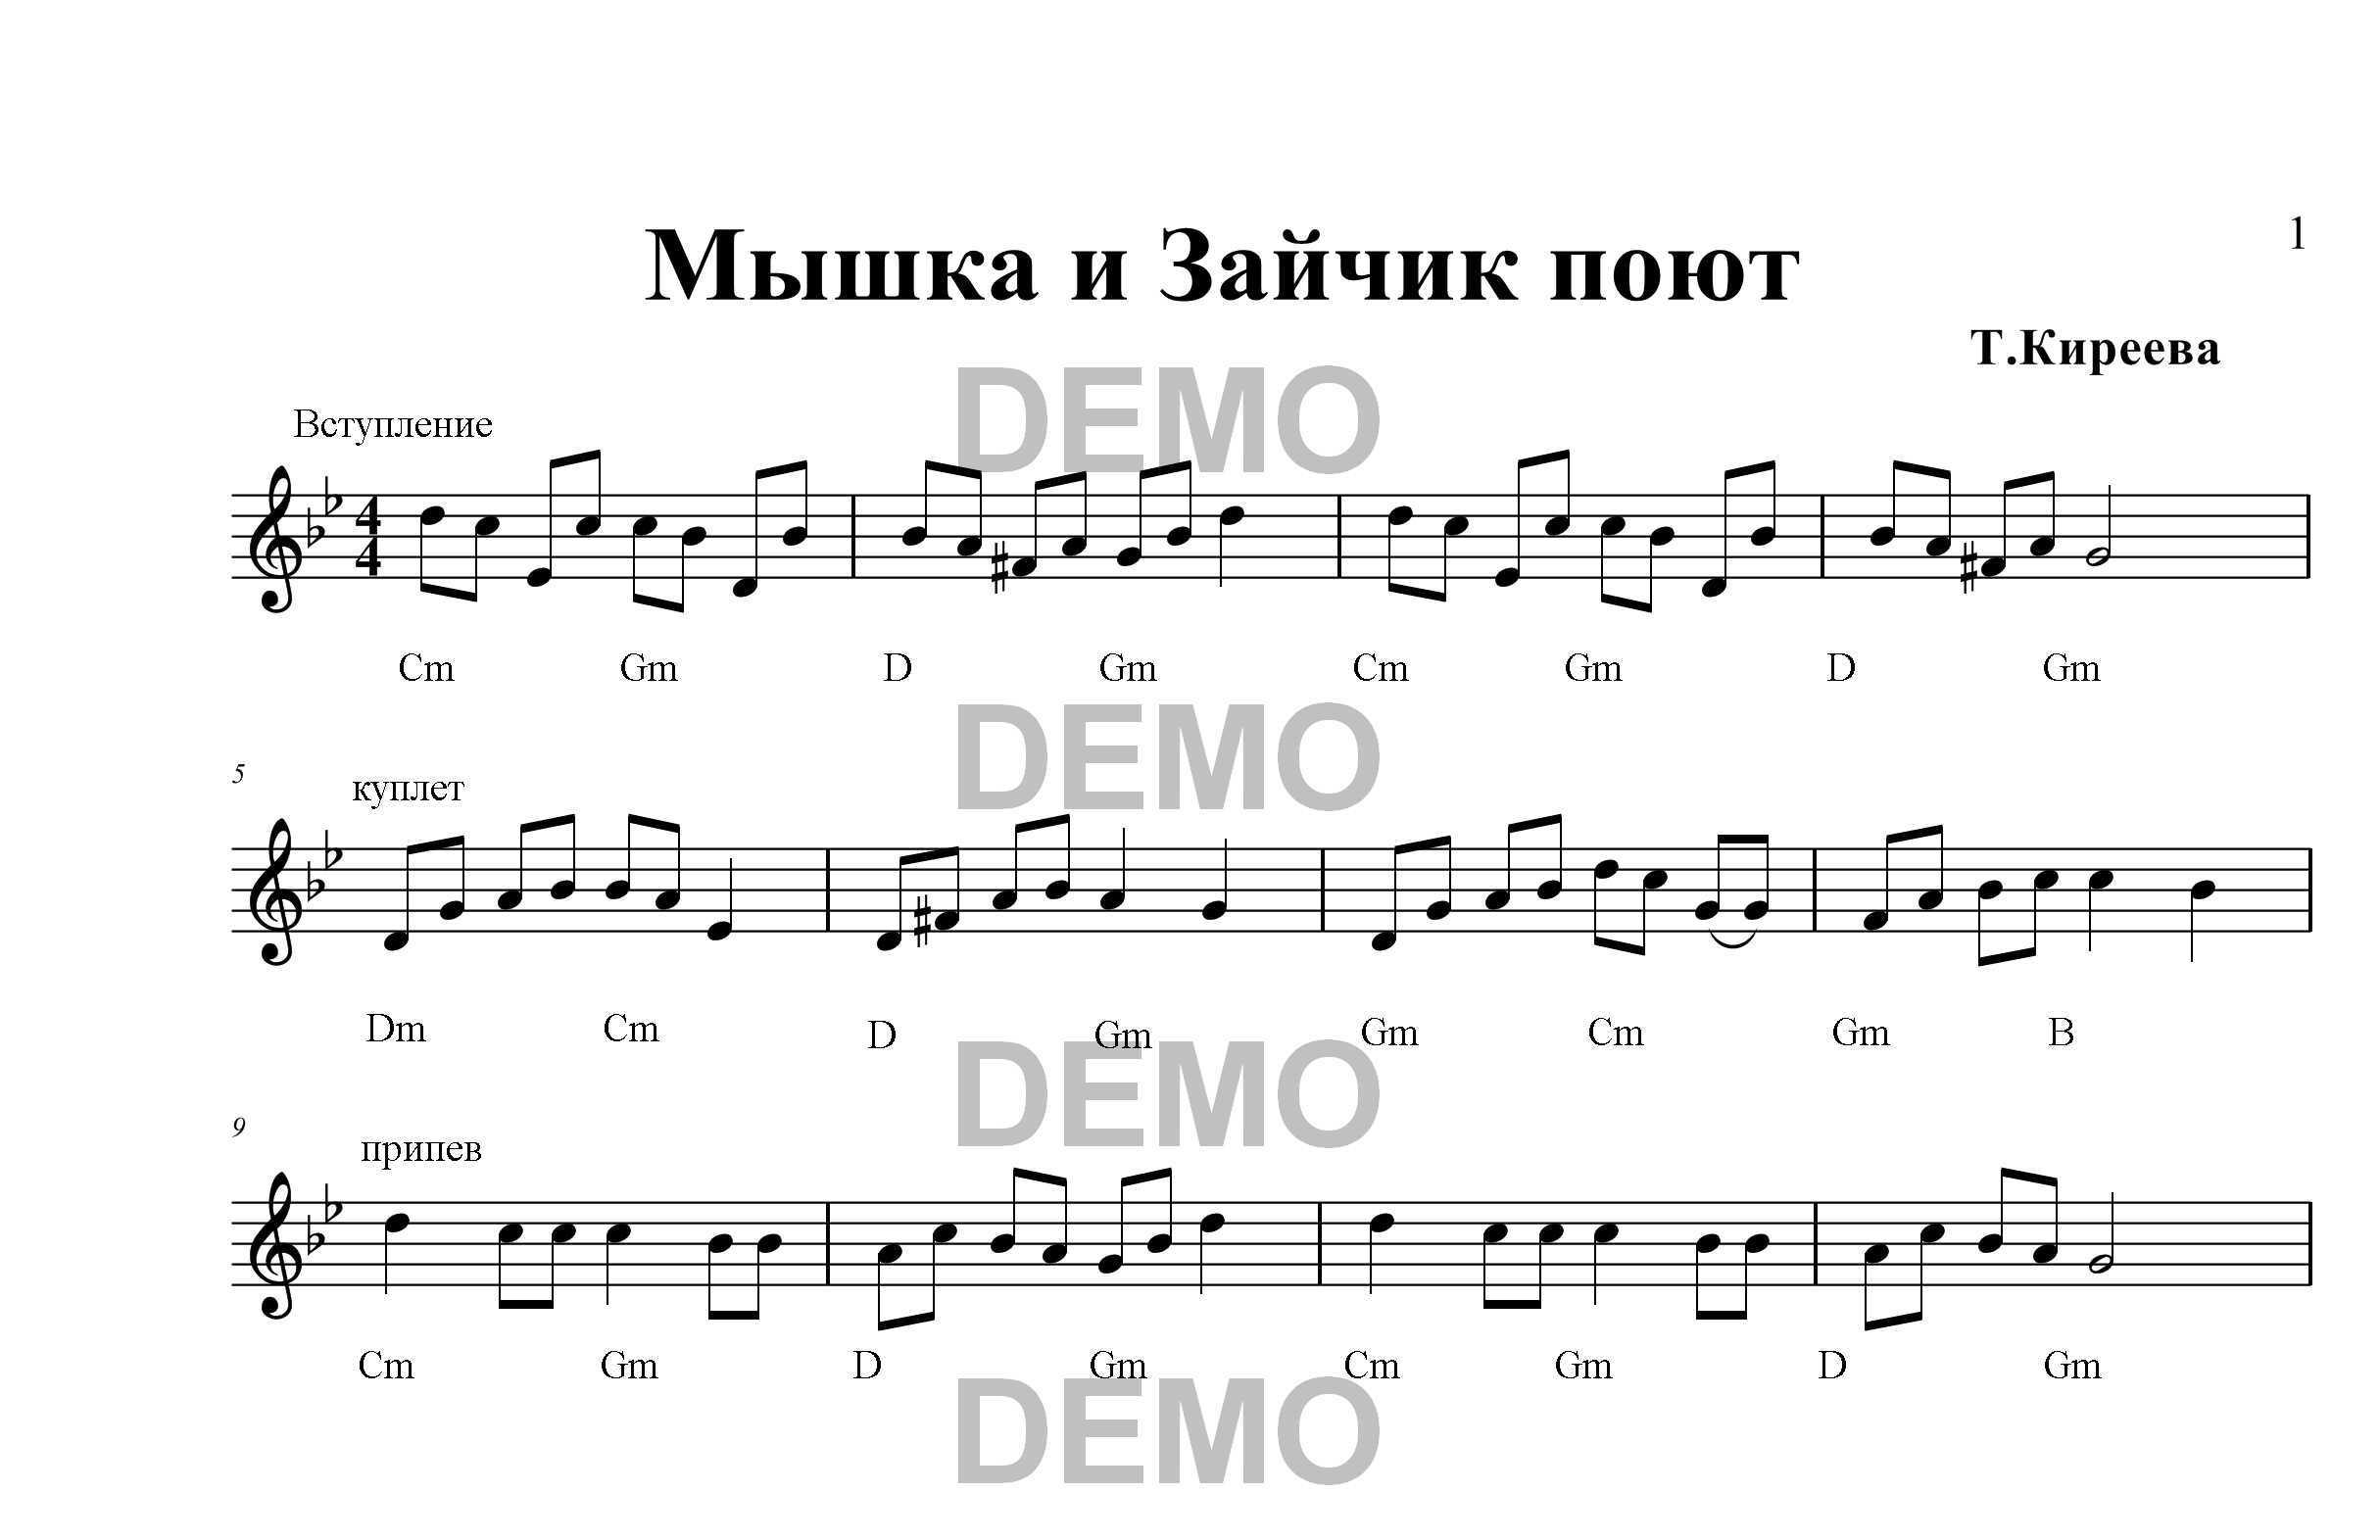 Скачать музыку триада сказка